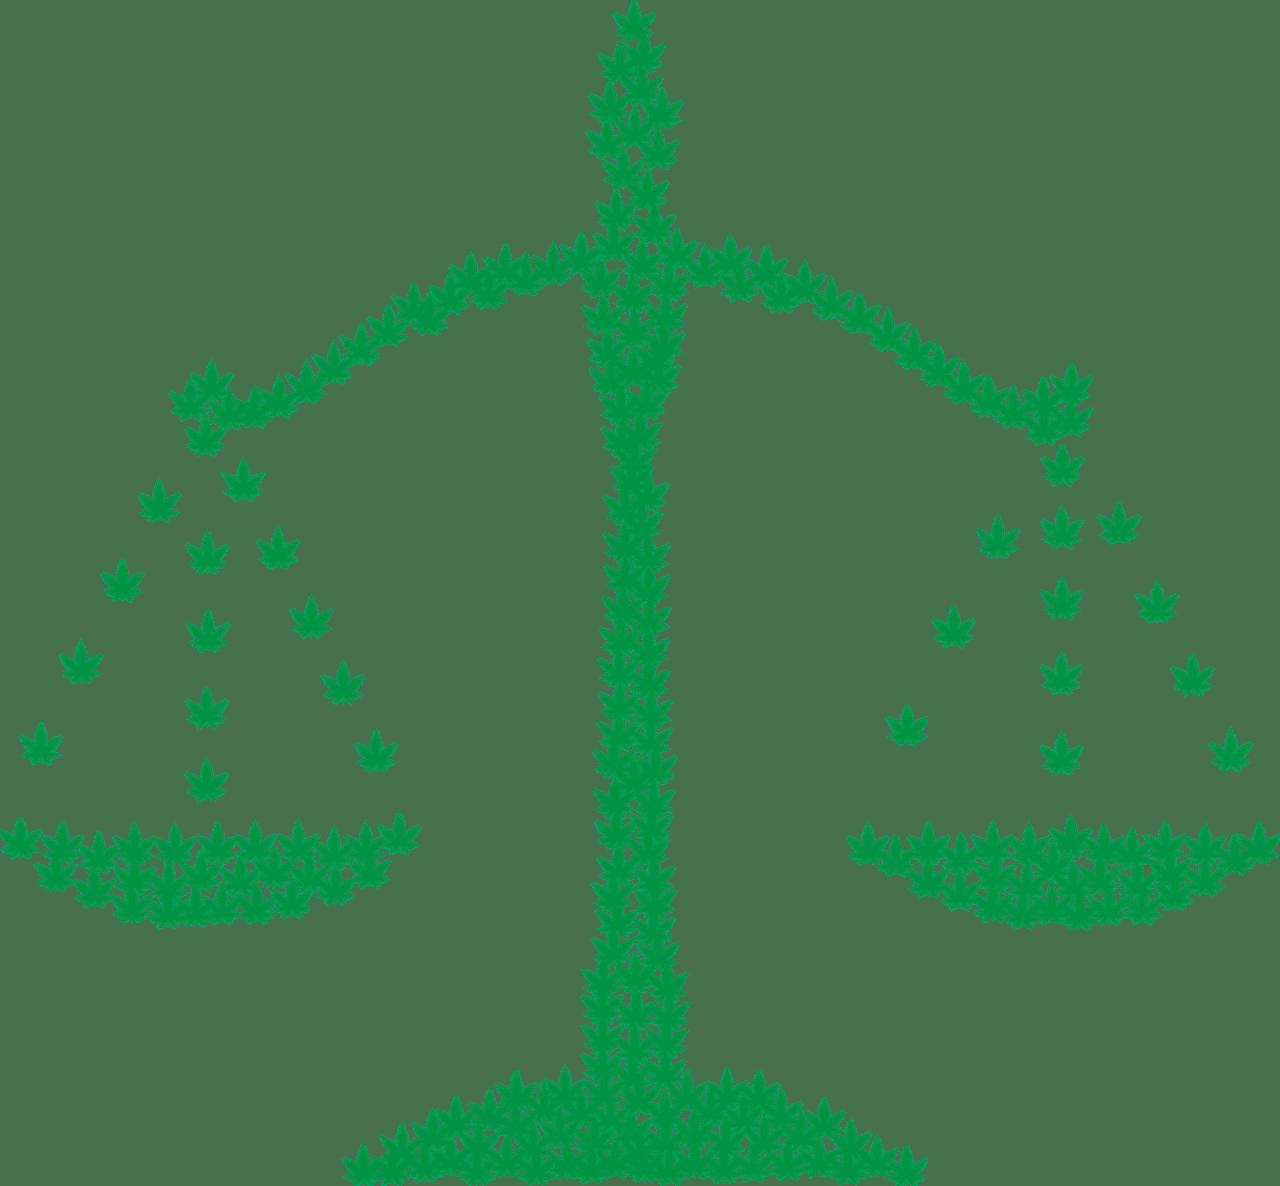 Nación Cannabis | ¿Mexicanos a favor o en contra de la legalización del cannabis?